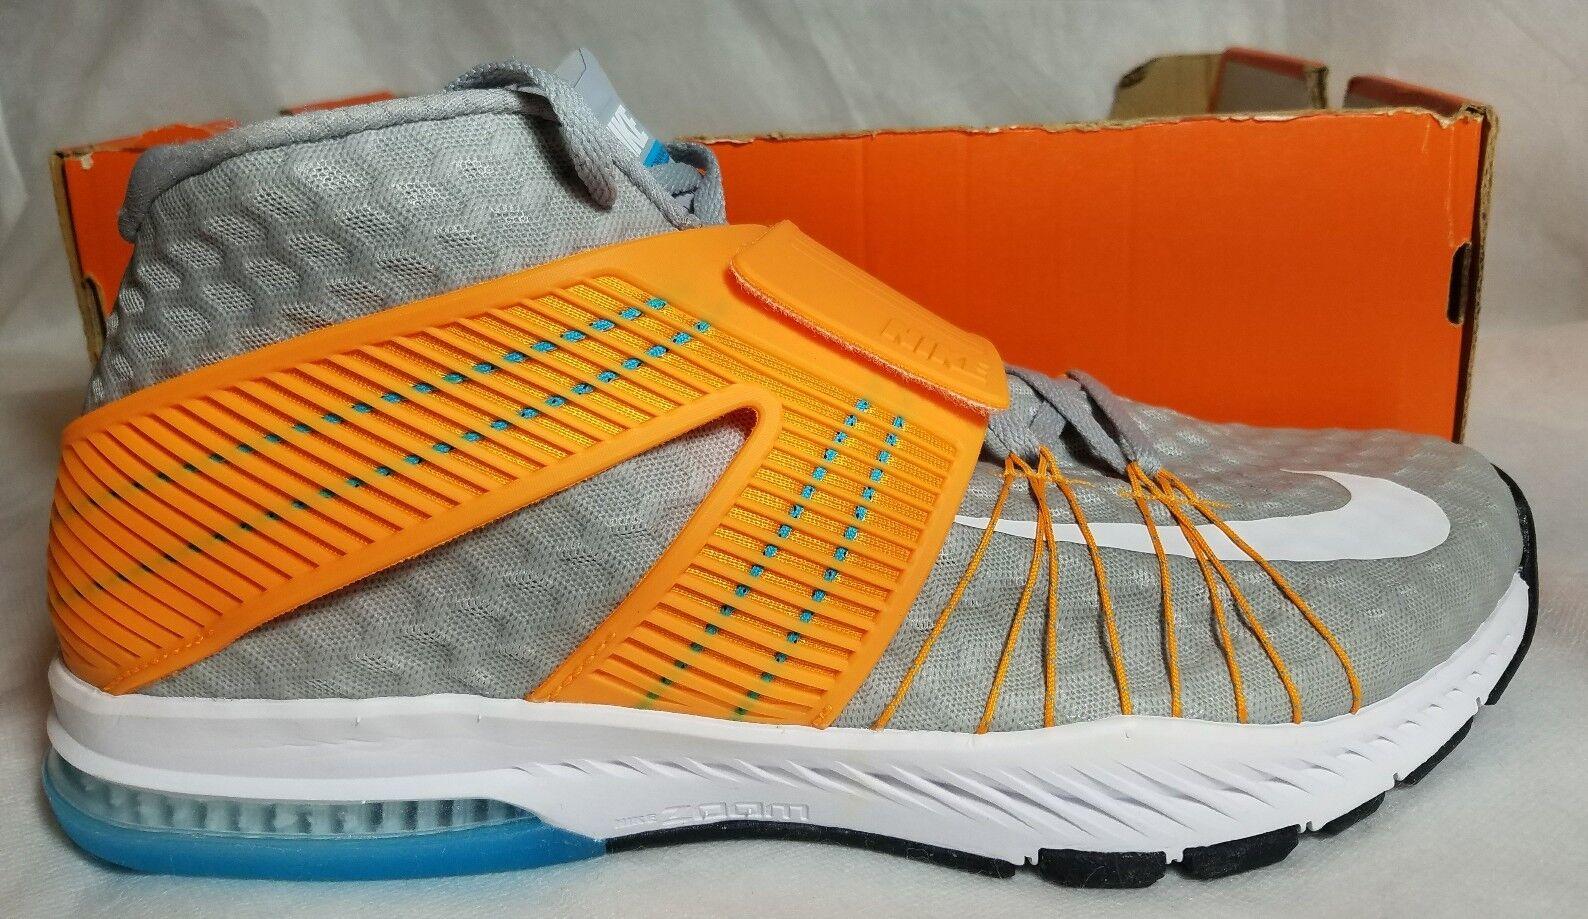 New Nike Zoom Train Tornada Strap Running shoes Men Size 11 Wolf Grey orange